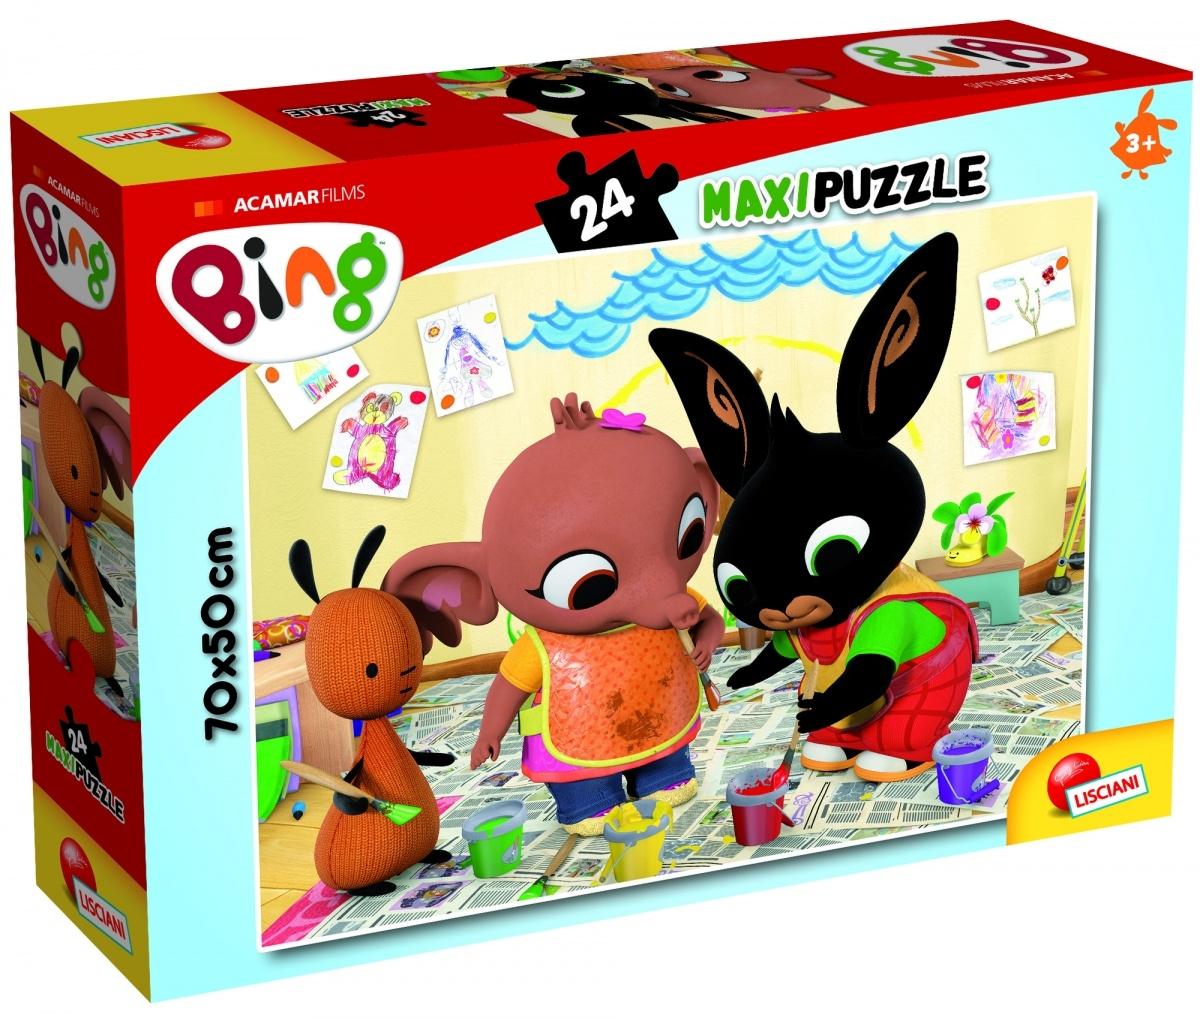 Puzzle Maxi 24: Bing - Atak sztuki! (304-81202)